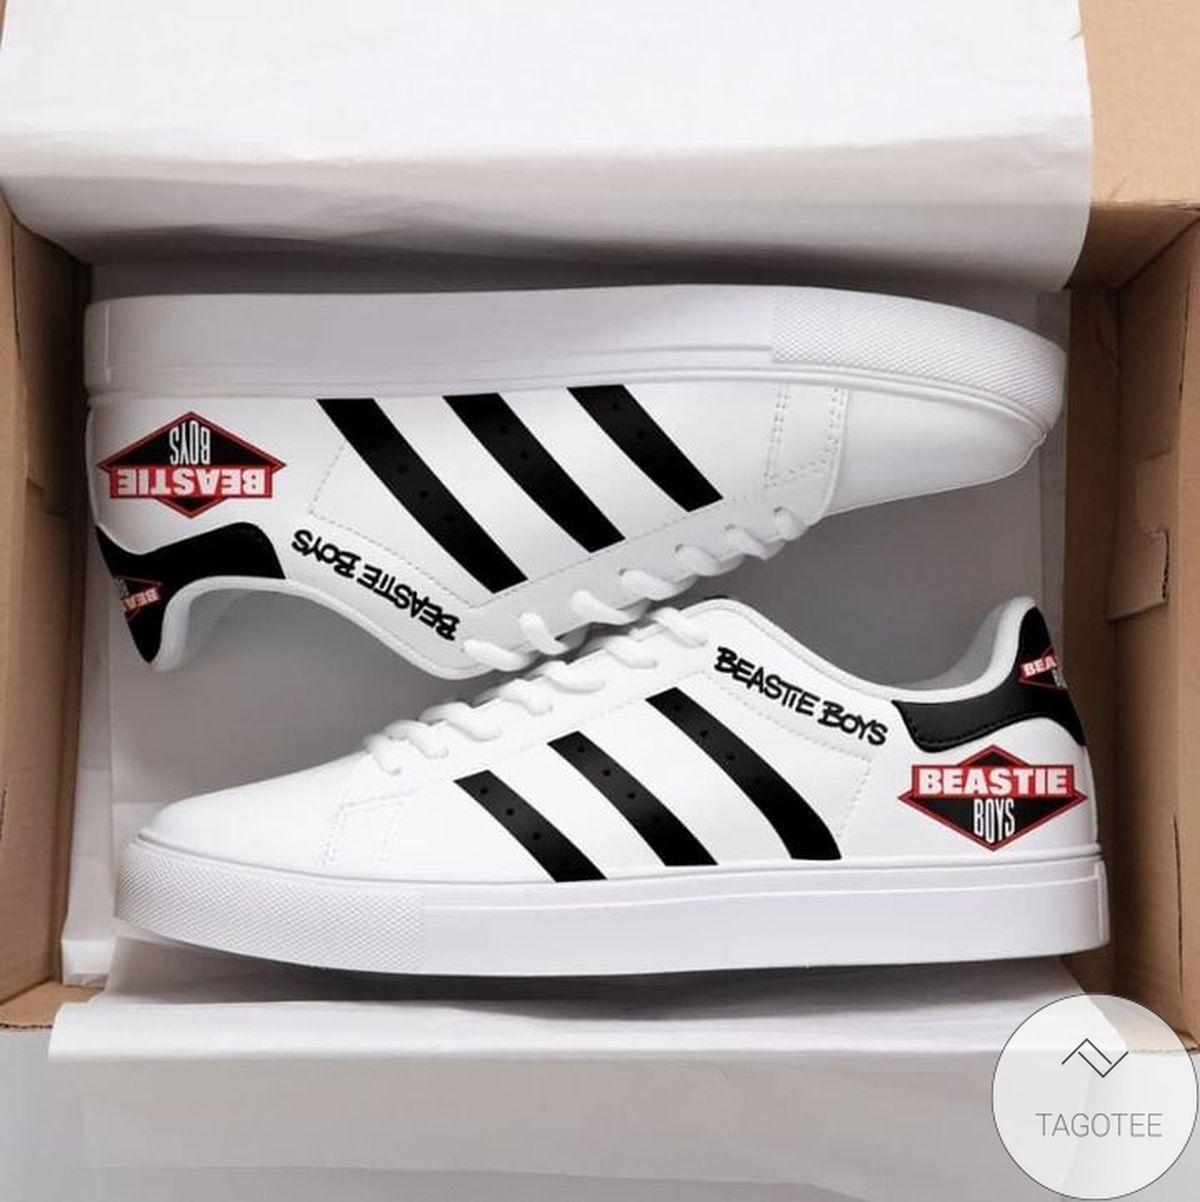 Sale Off Beastie Boys Grey Stan Smith Shoes